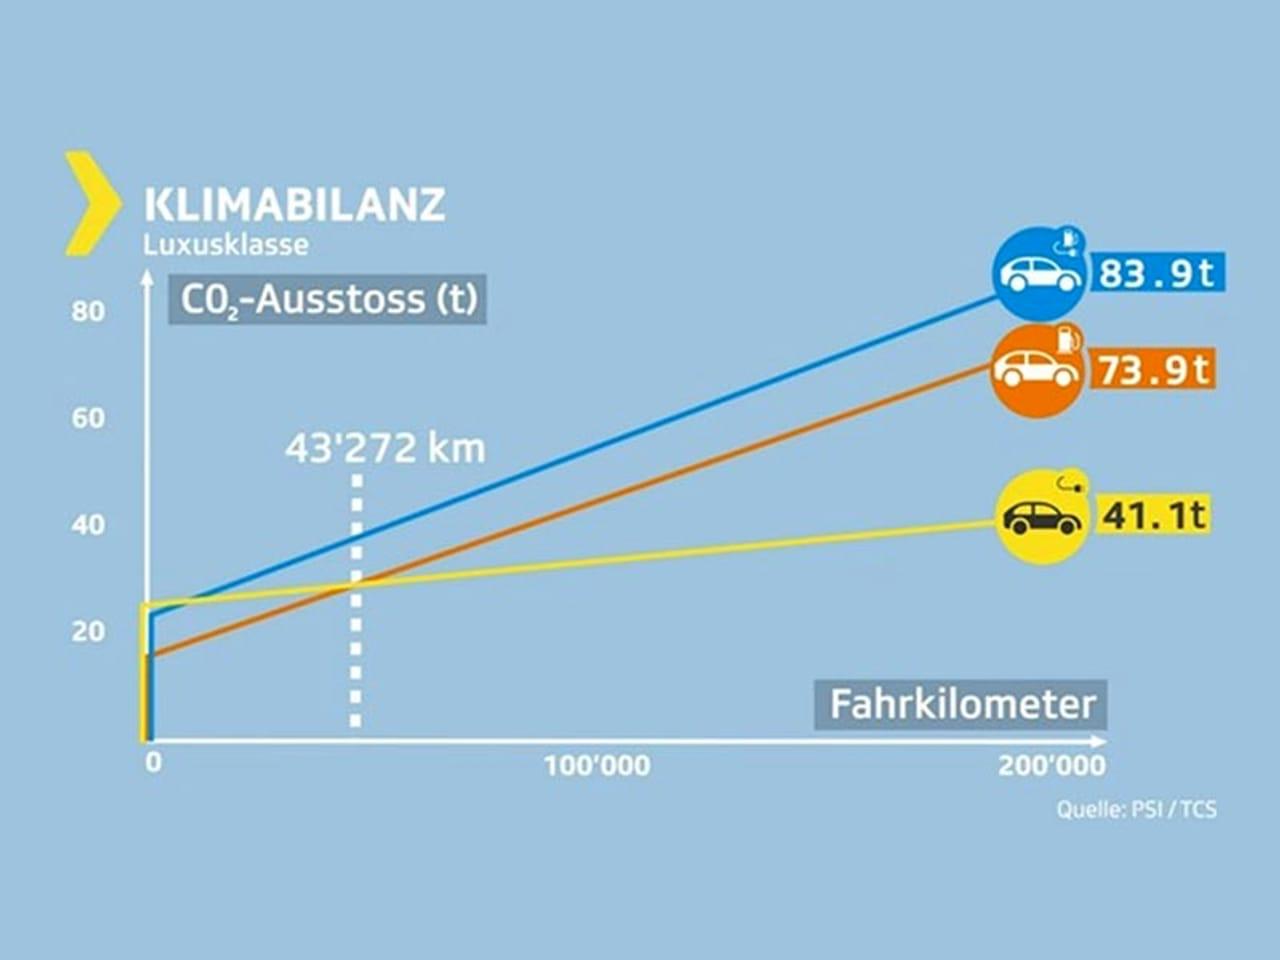 Elektroautos lassen Hybride und Verbrenner locker stehen - ah Auto Hermann AG - Ebnat-Kappel 2